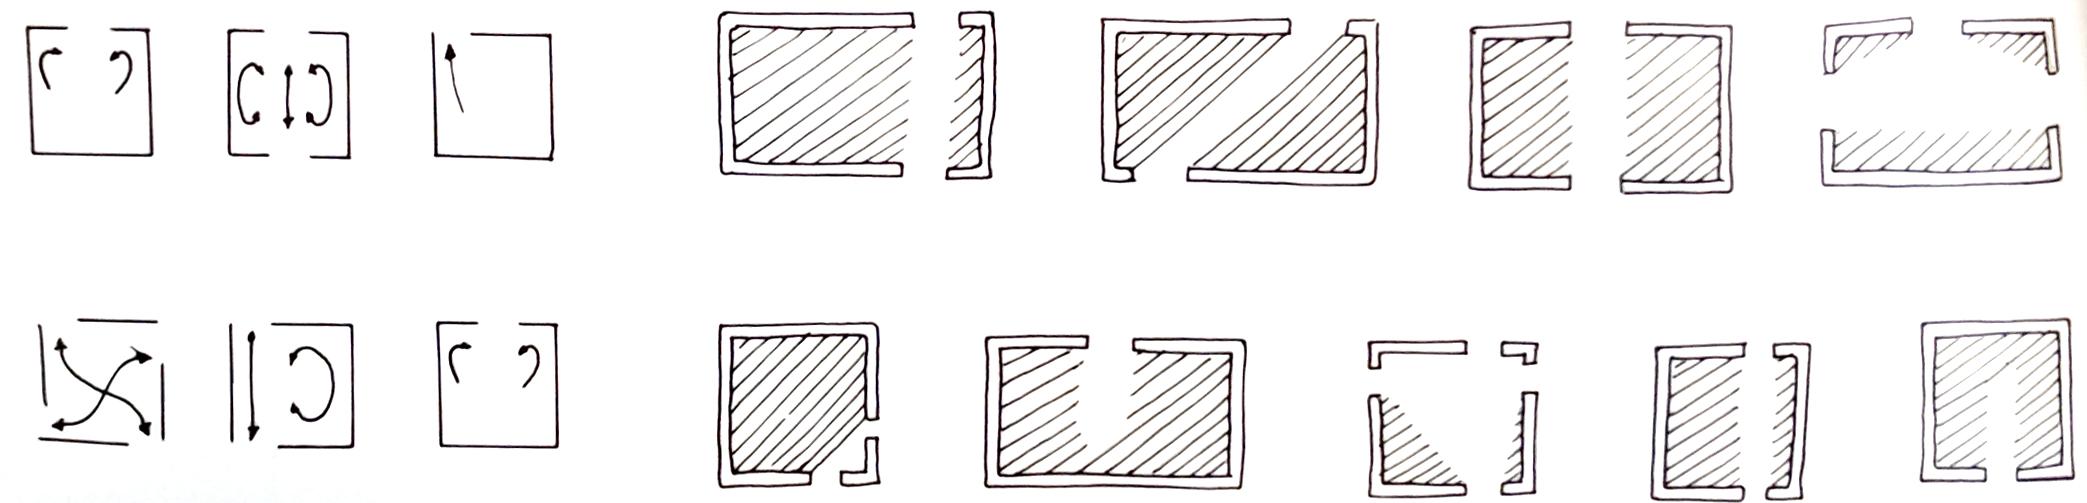 Diagram explaining circulation based on door placement taken from Elements of Spacemaking by Yatin Pandya.